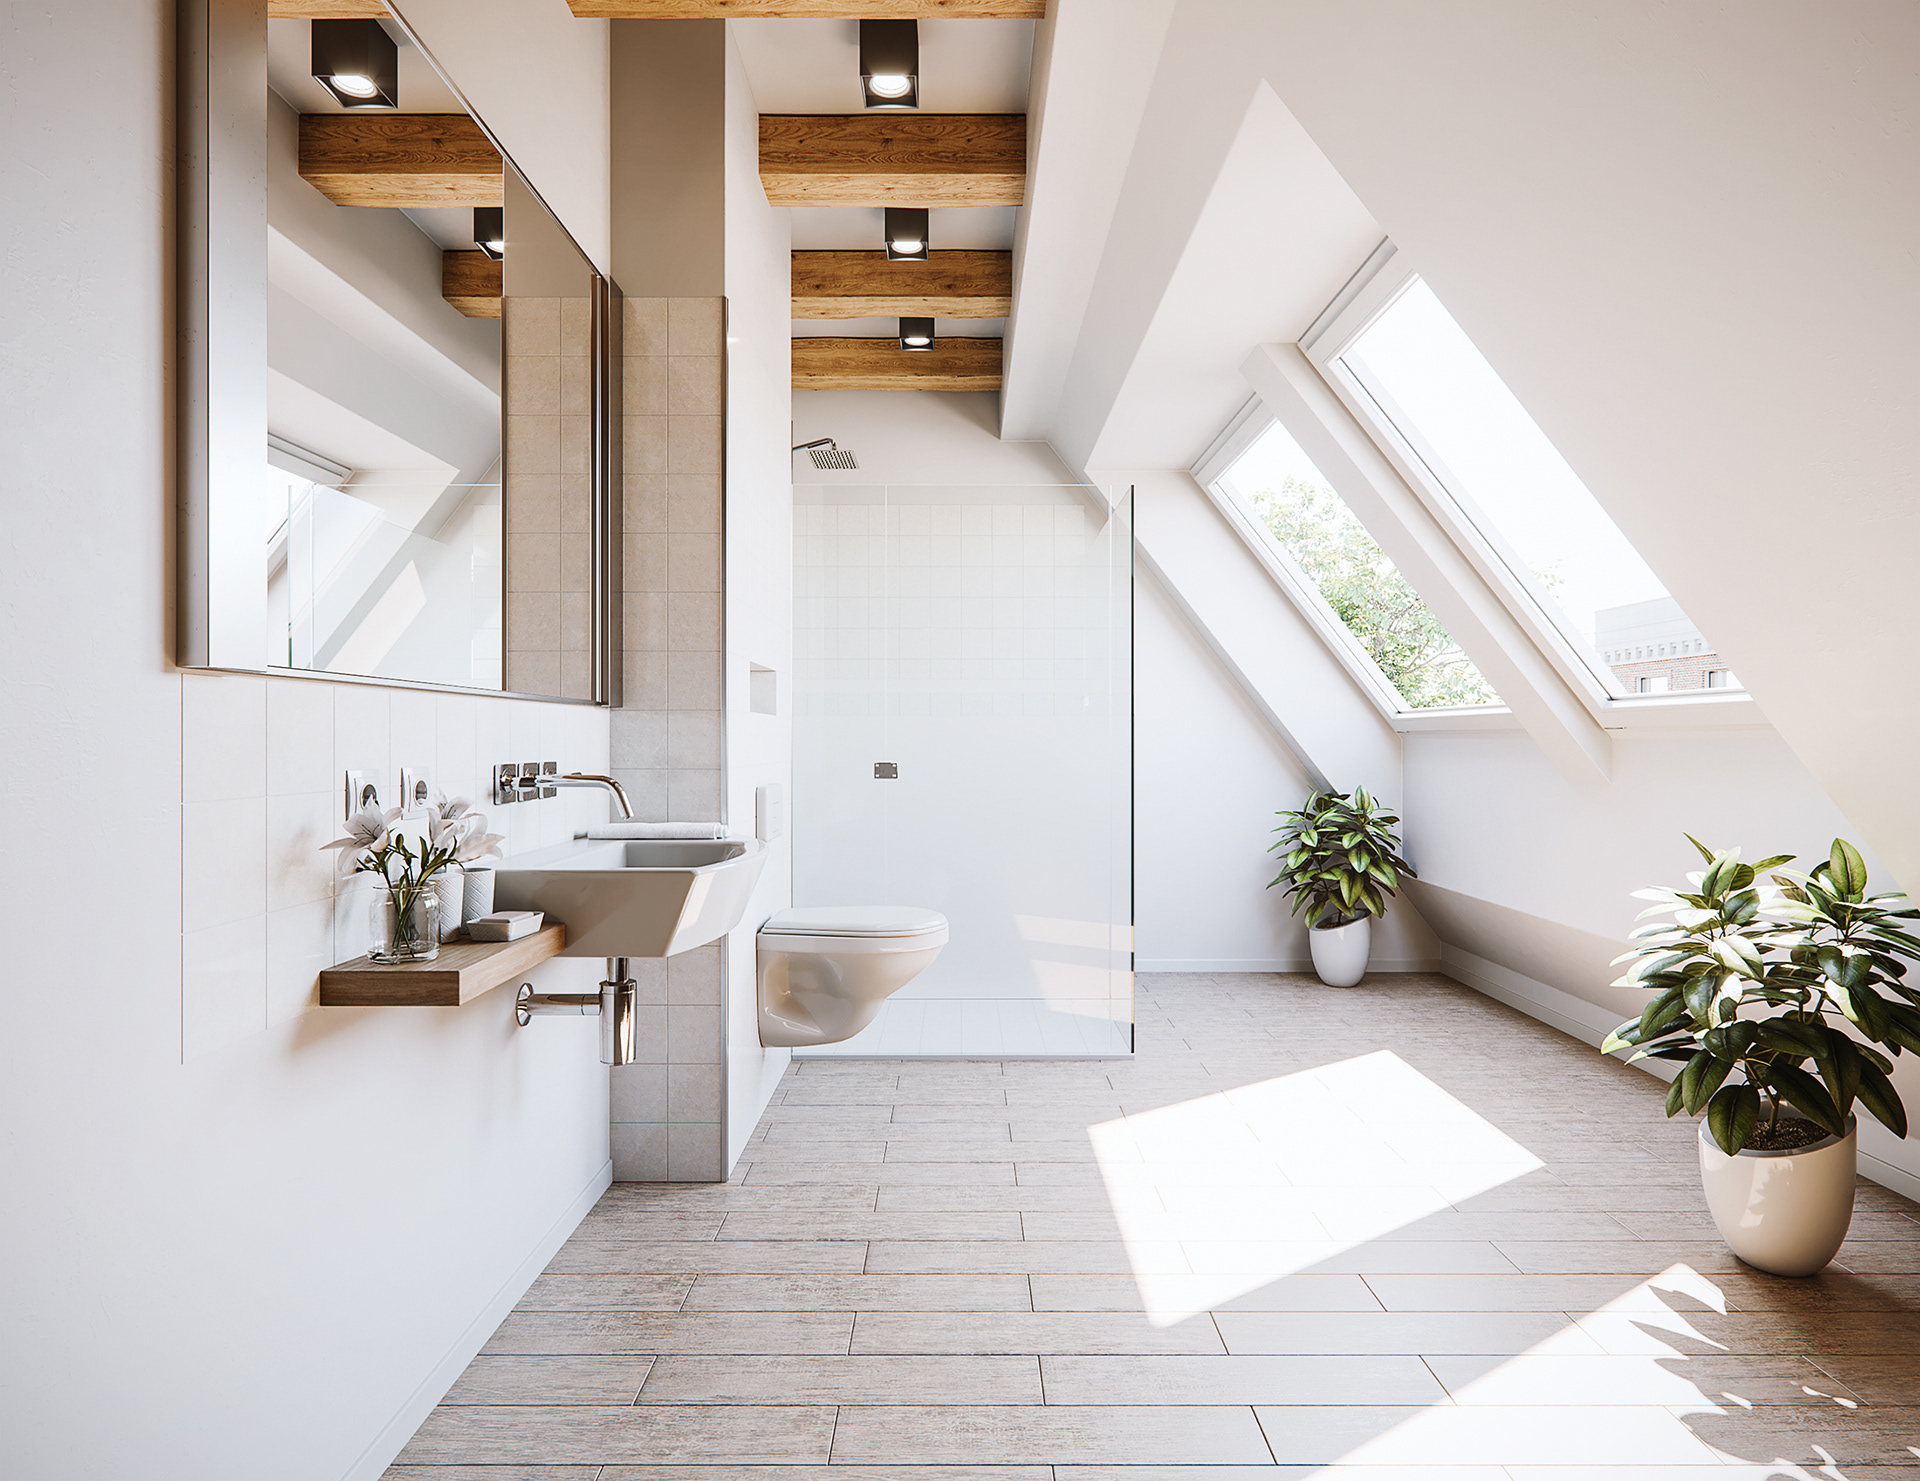 Nejc Kilar Small Attic Bathroom Remake - Bathroom remake